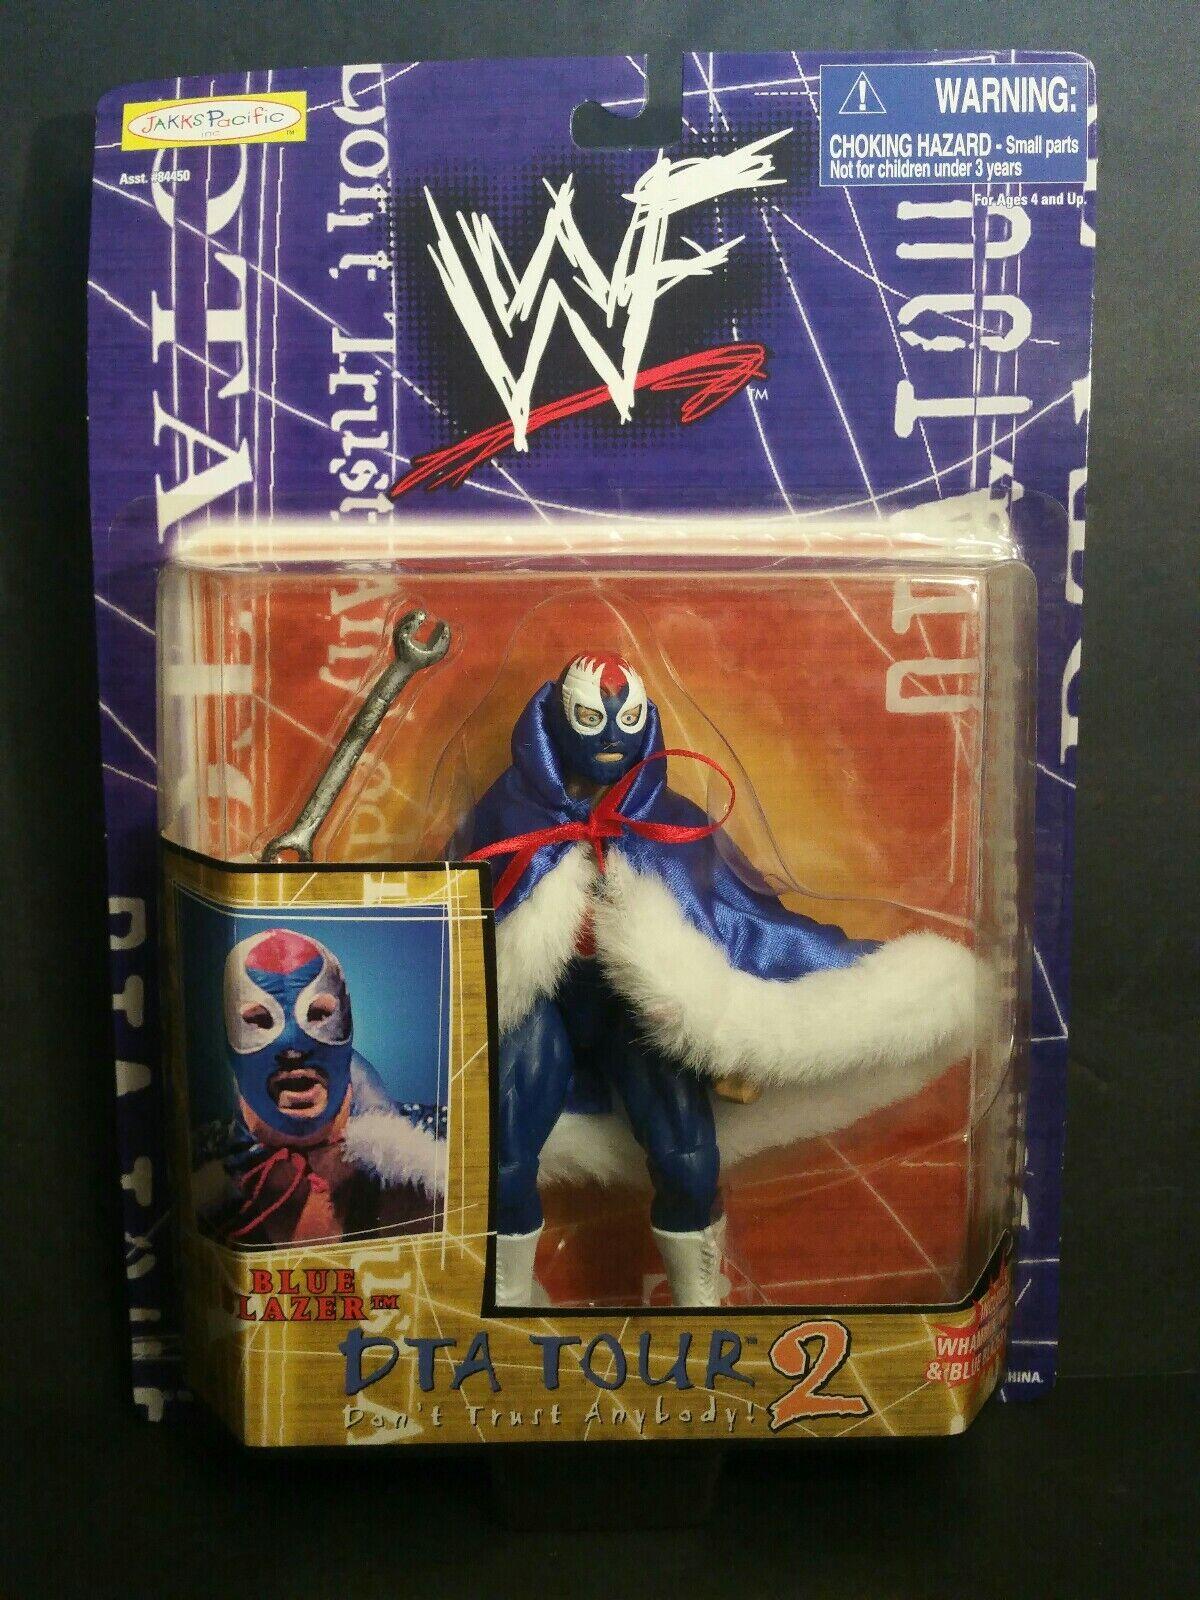 WWF Dta Tour 2 blu Blazer figura de acción (107) (6-12)